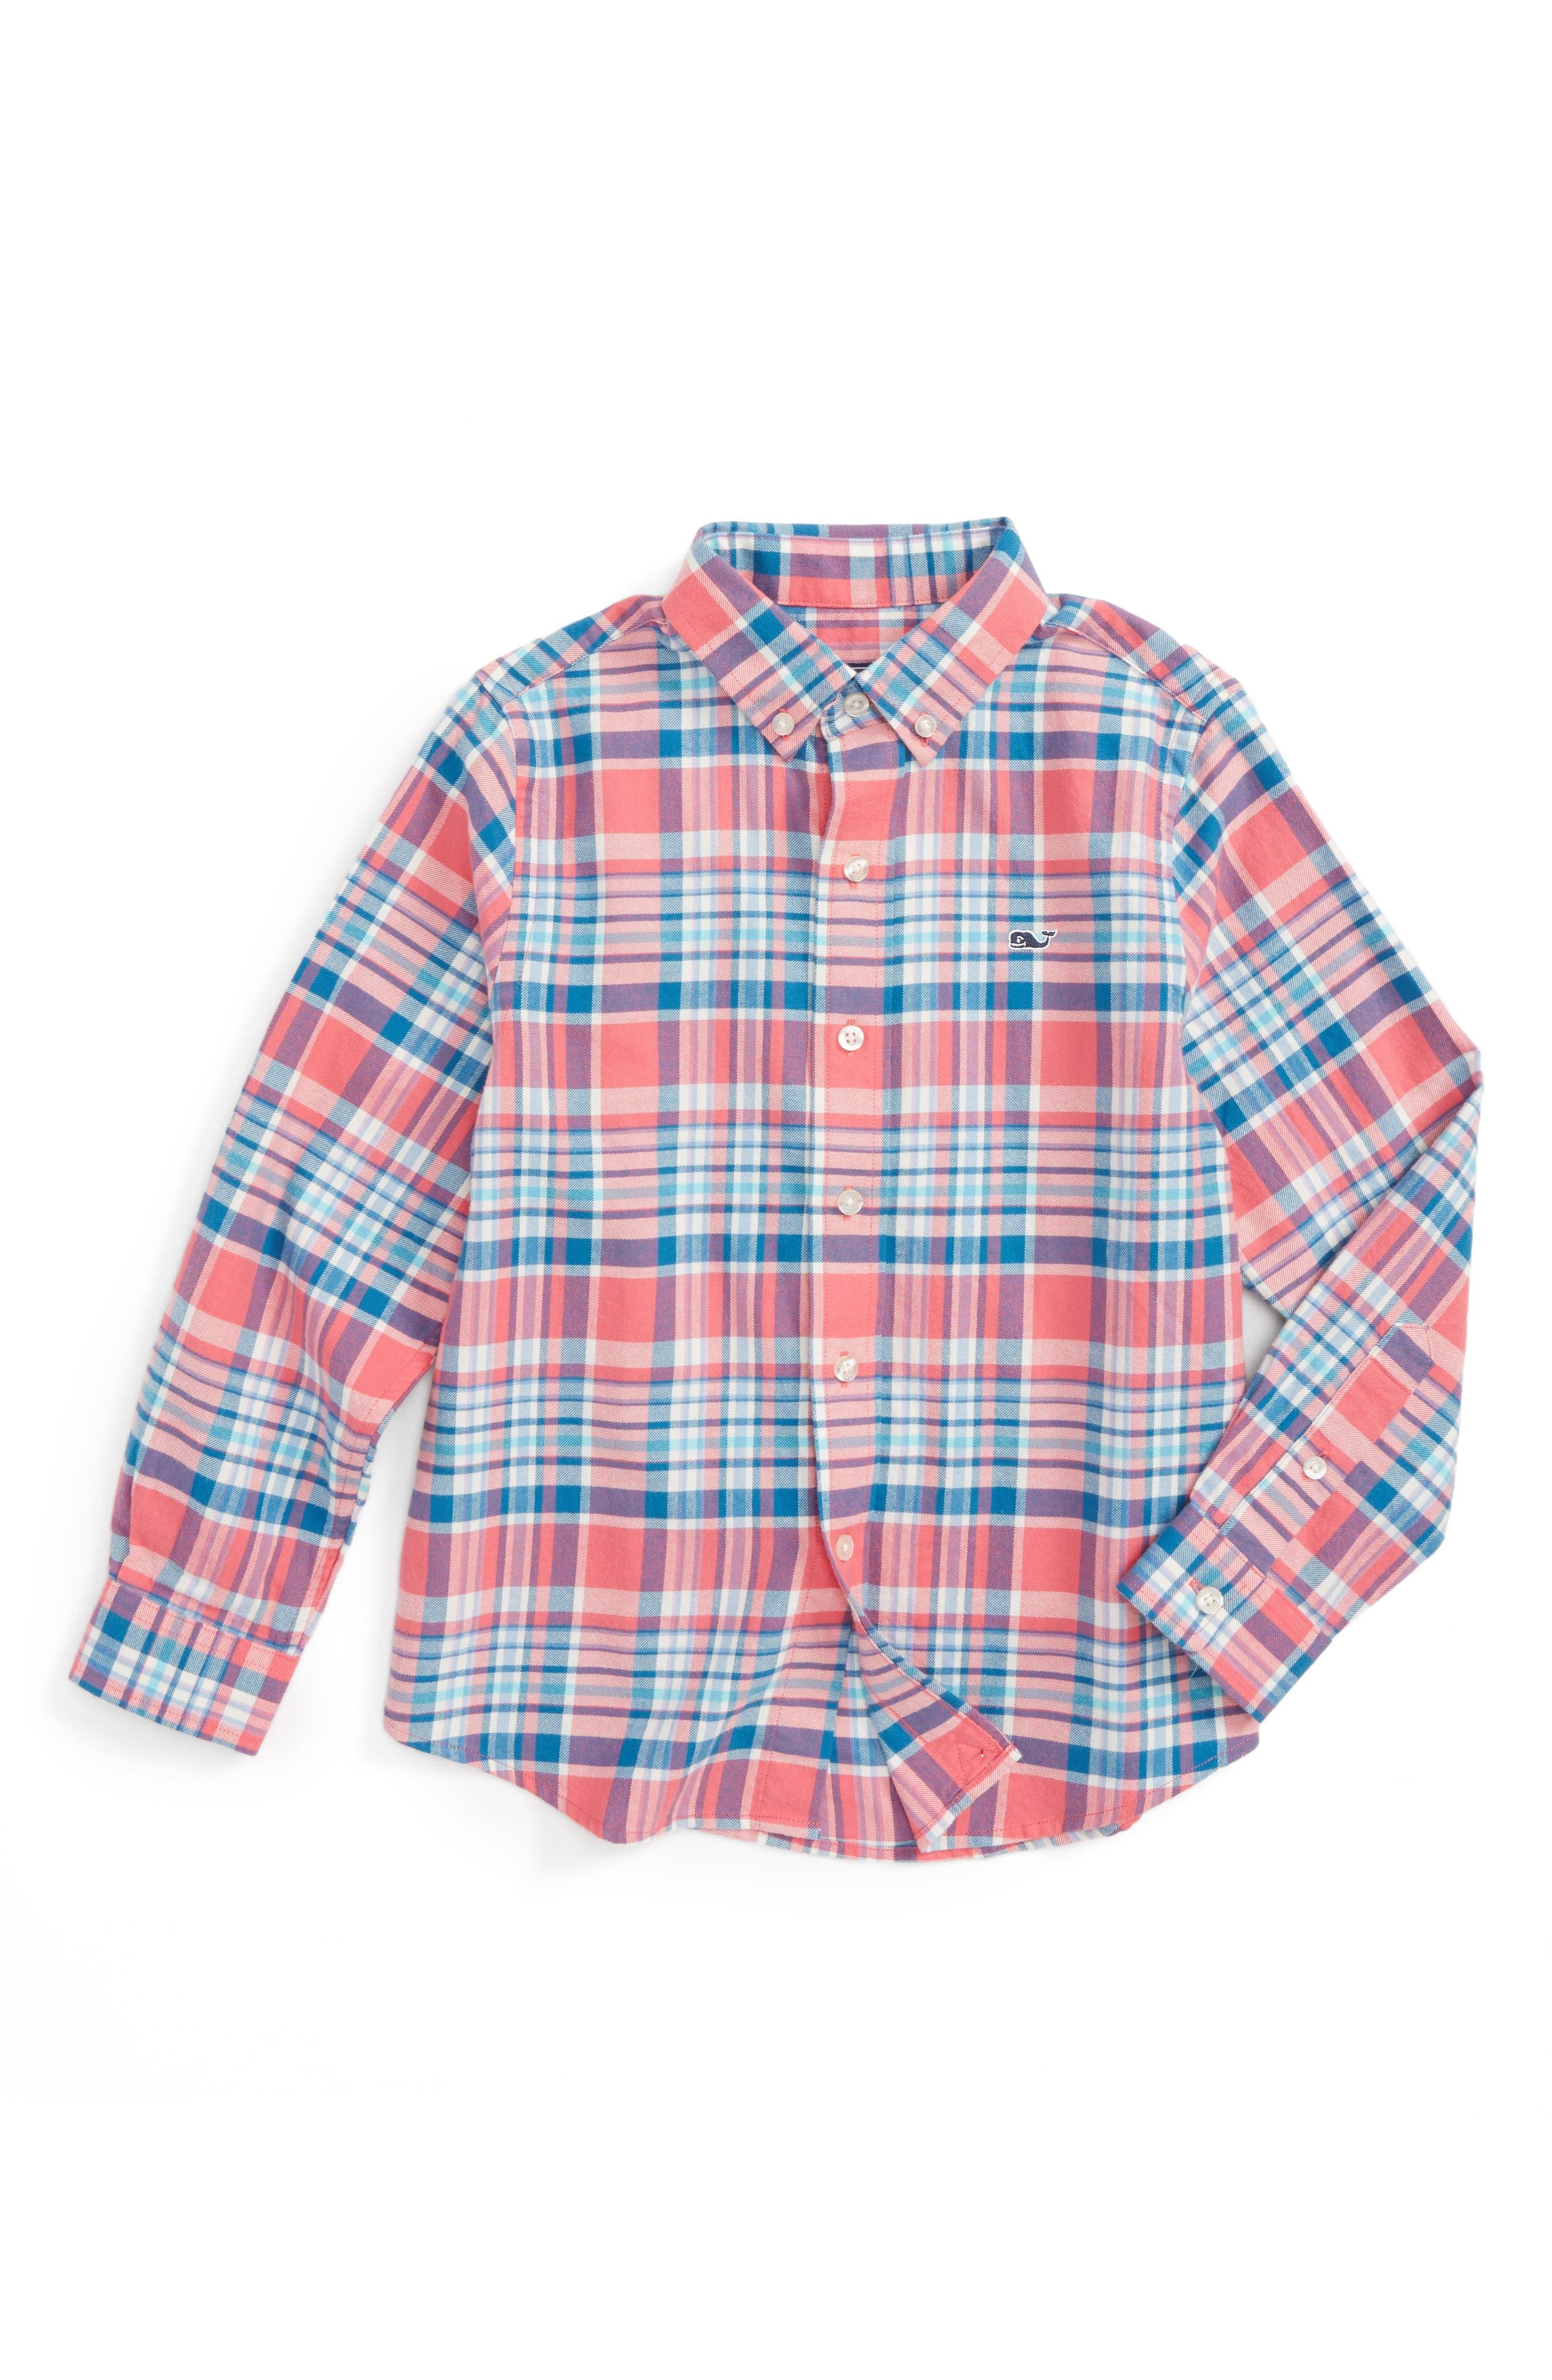 Main Image - vineyard vines Middleton Plaid Flannel Shirt (Toddler Boys & Little Boys)